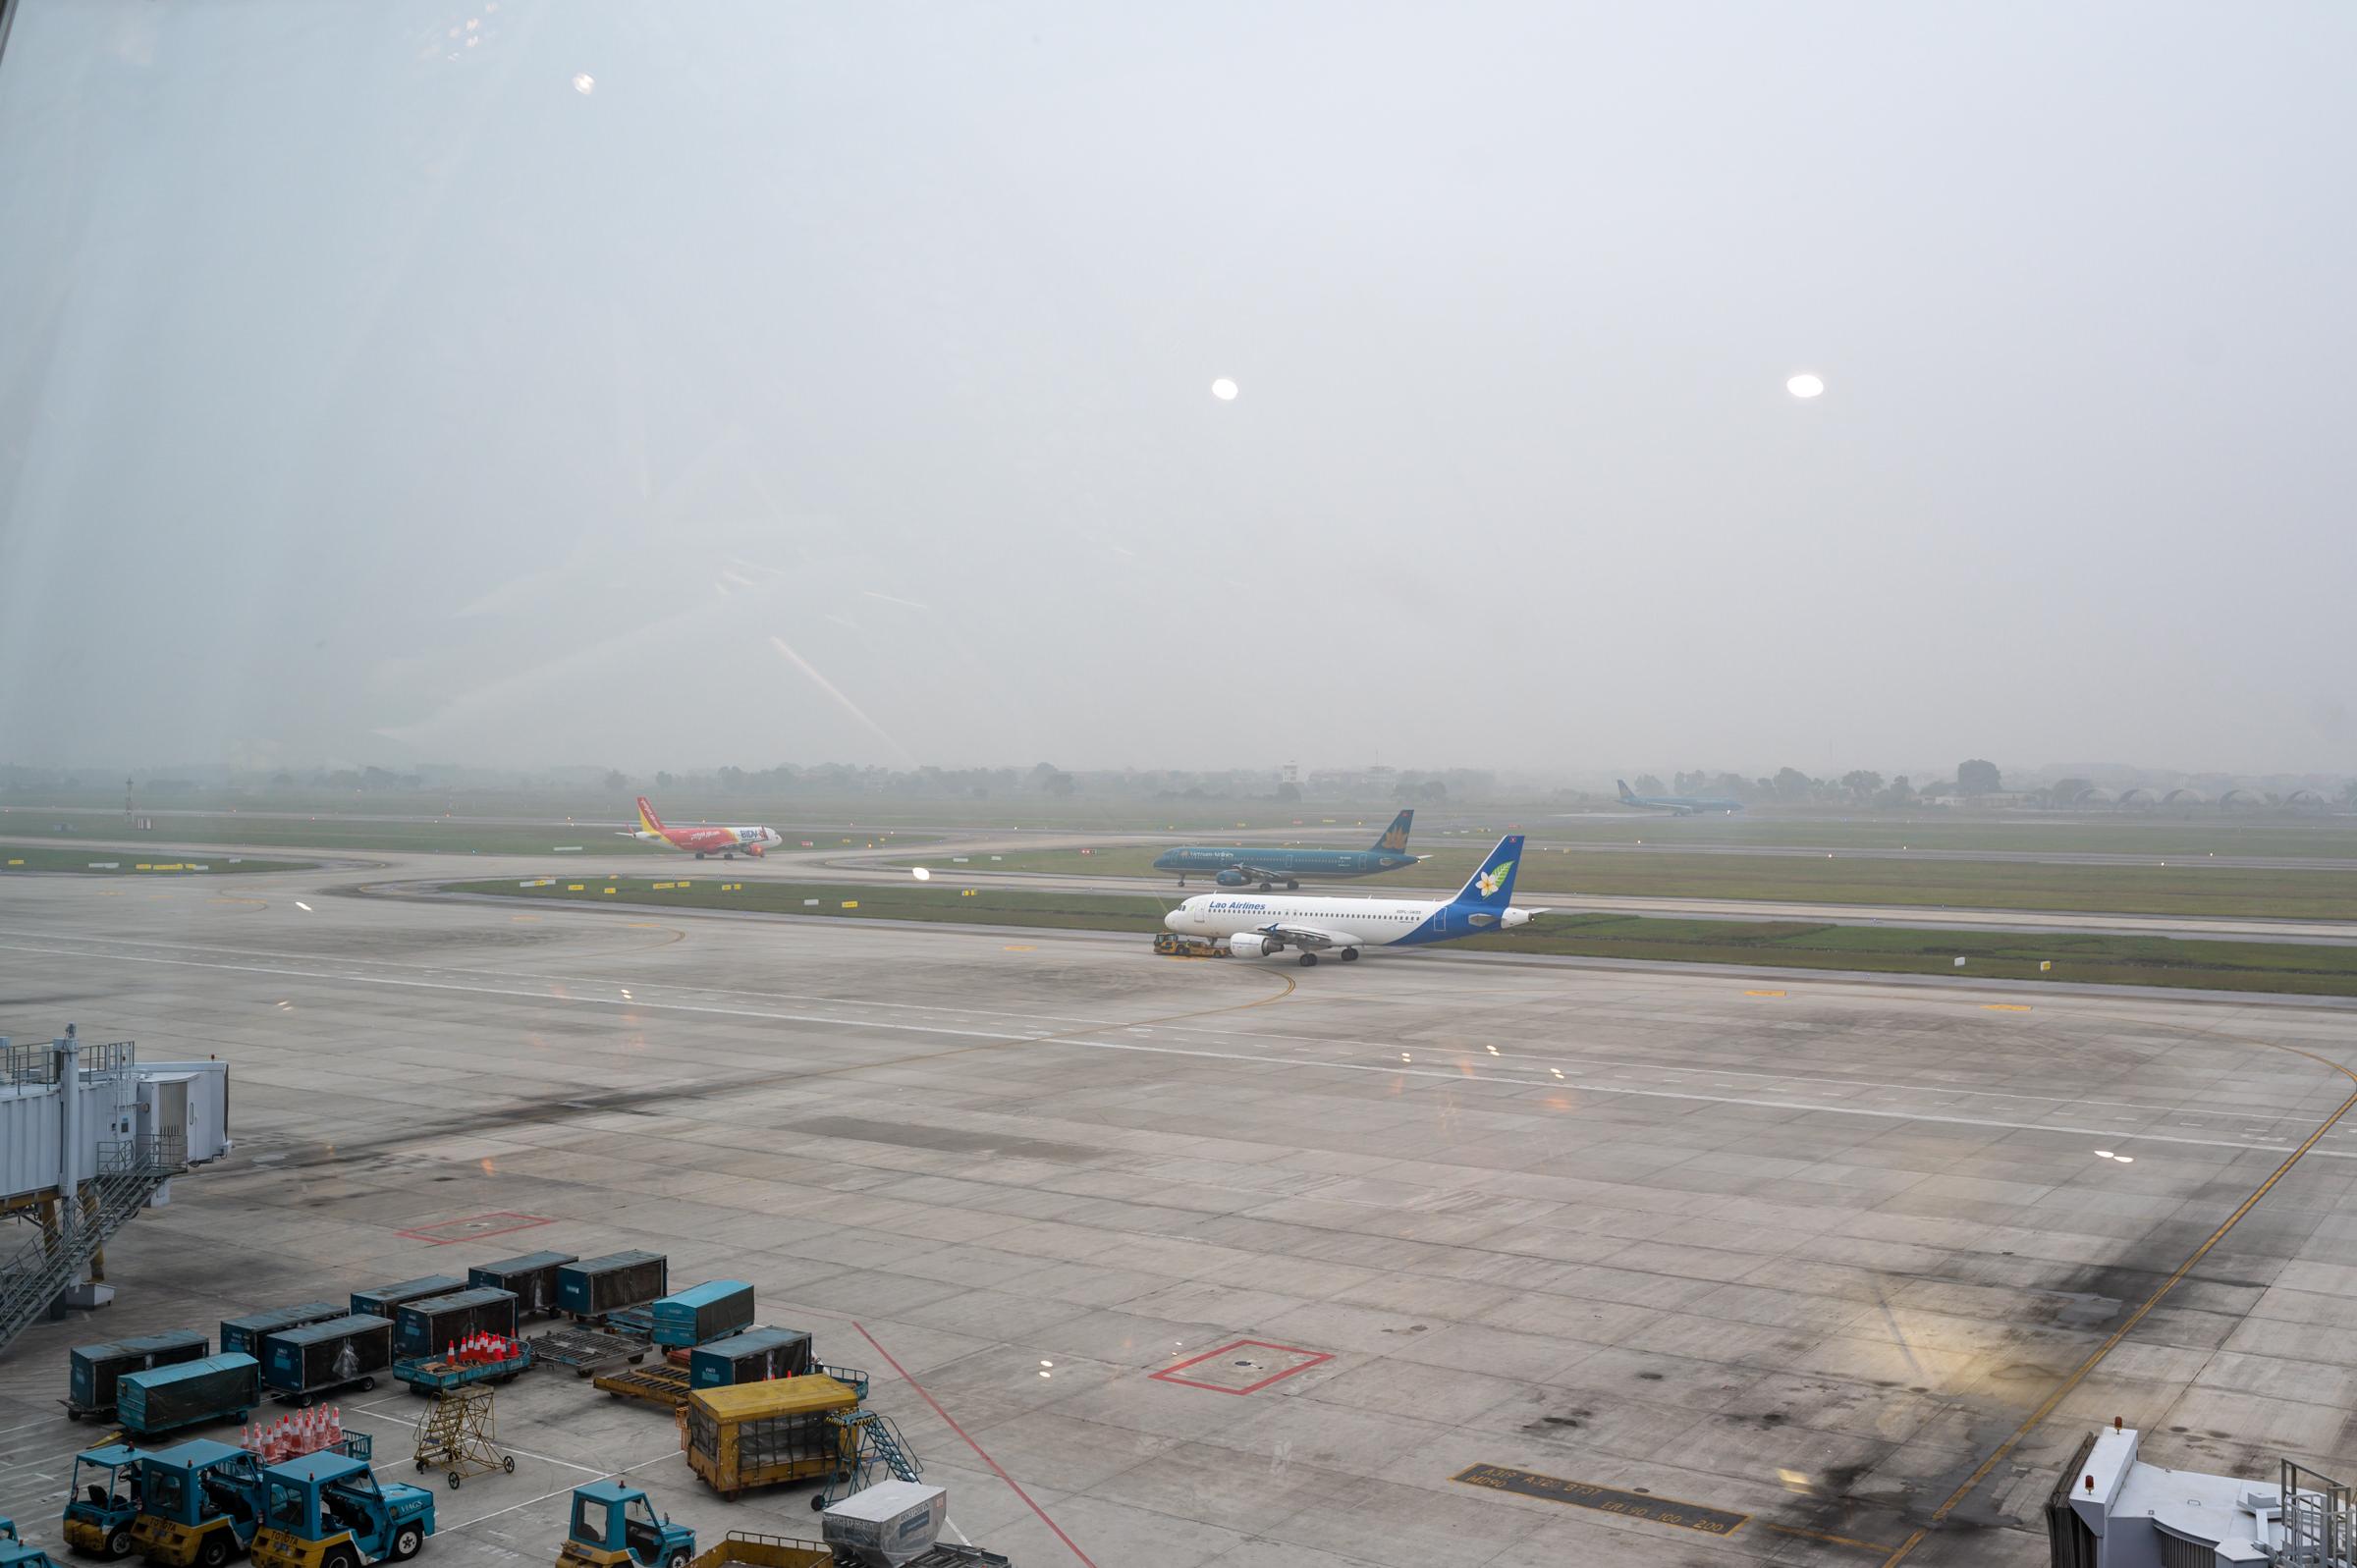 Runway View  Vietnam Airlines Lotus Lounge - Noi Bai International Airport